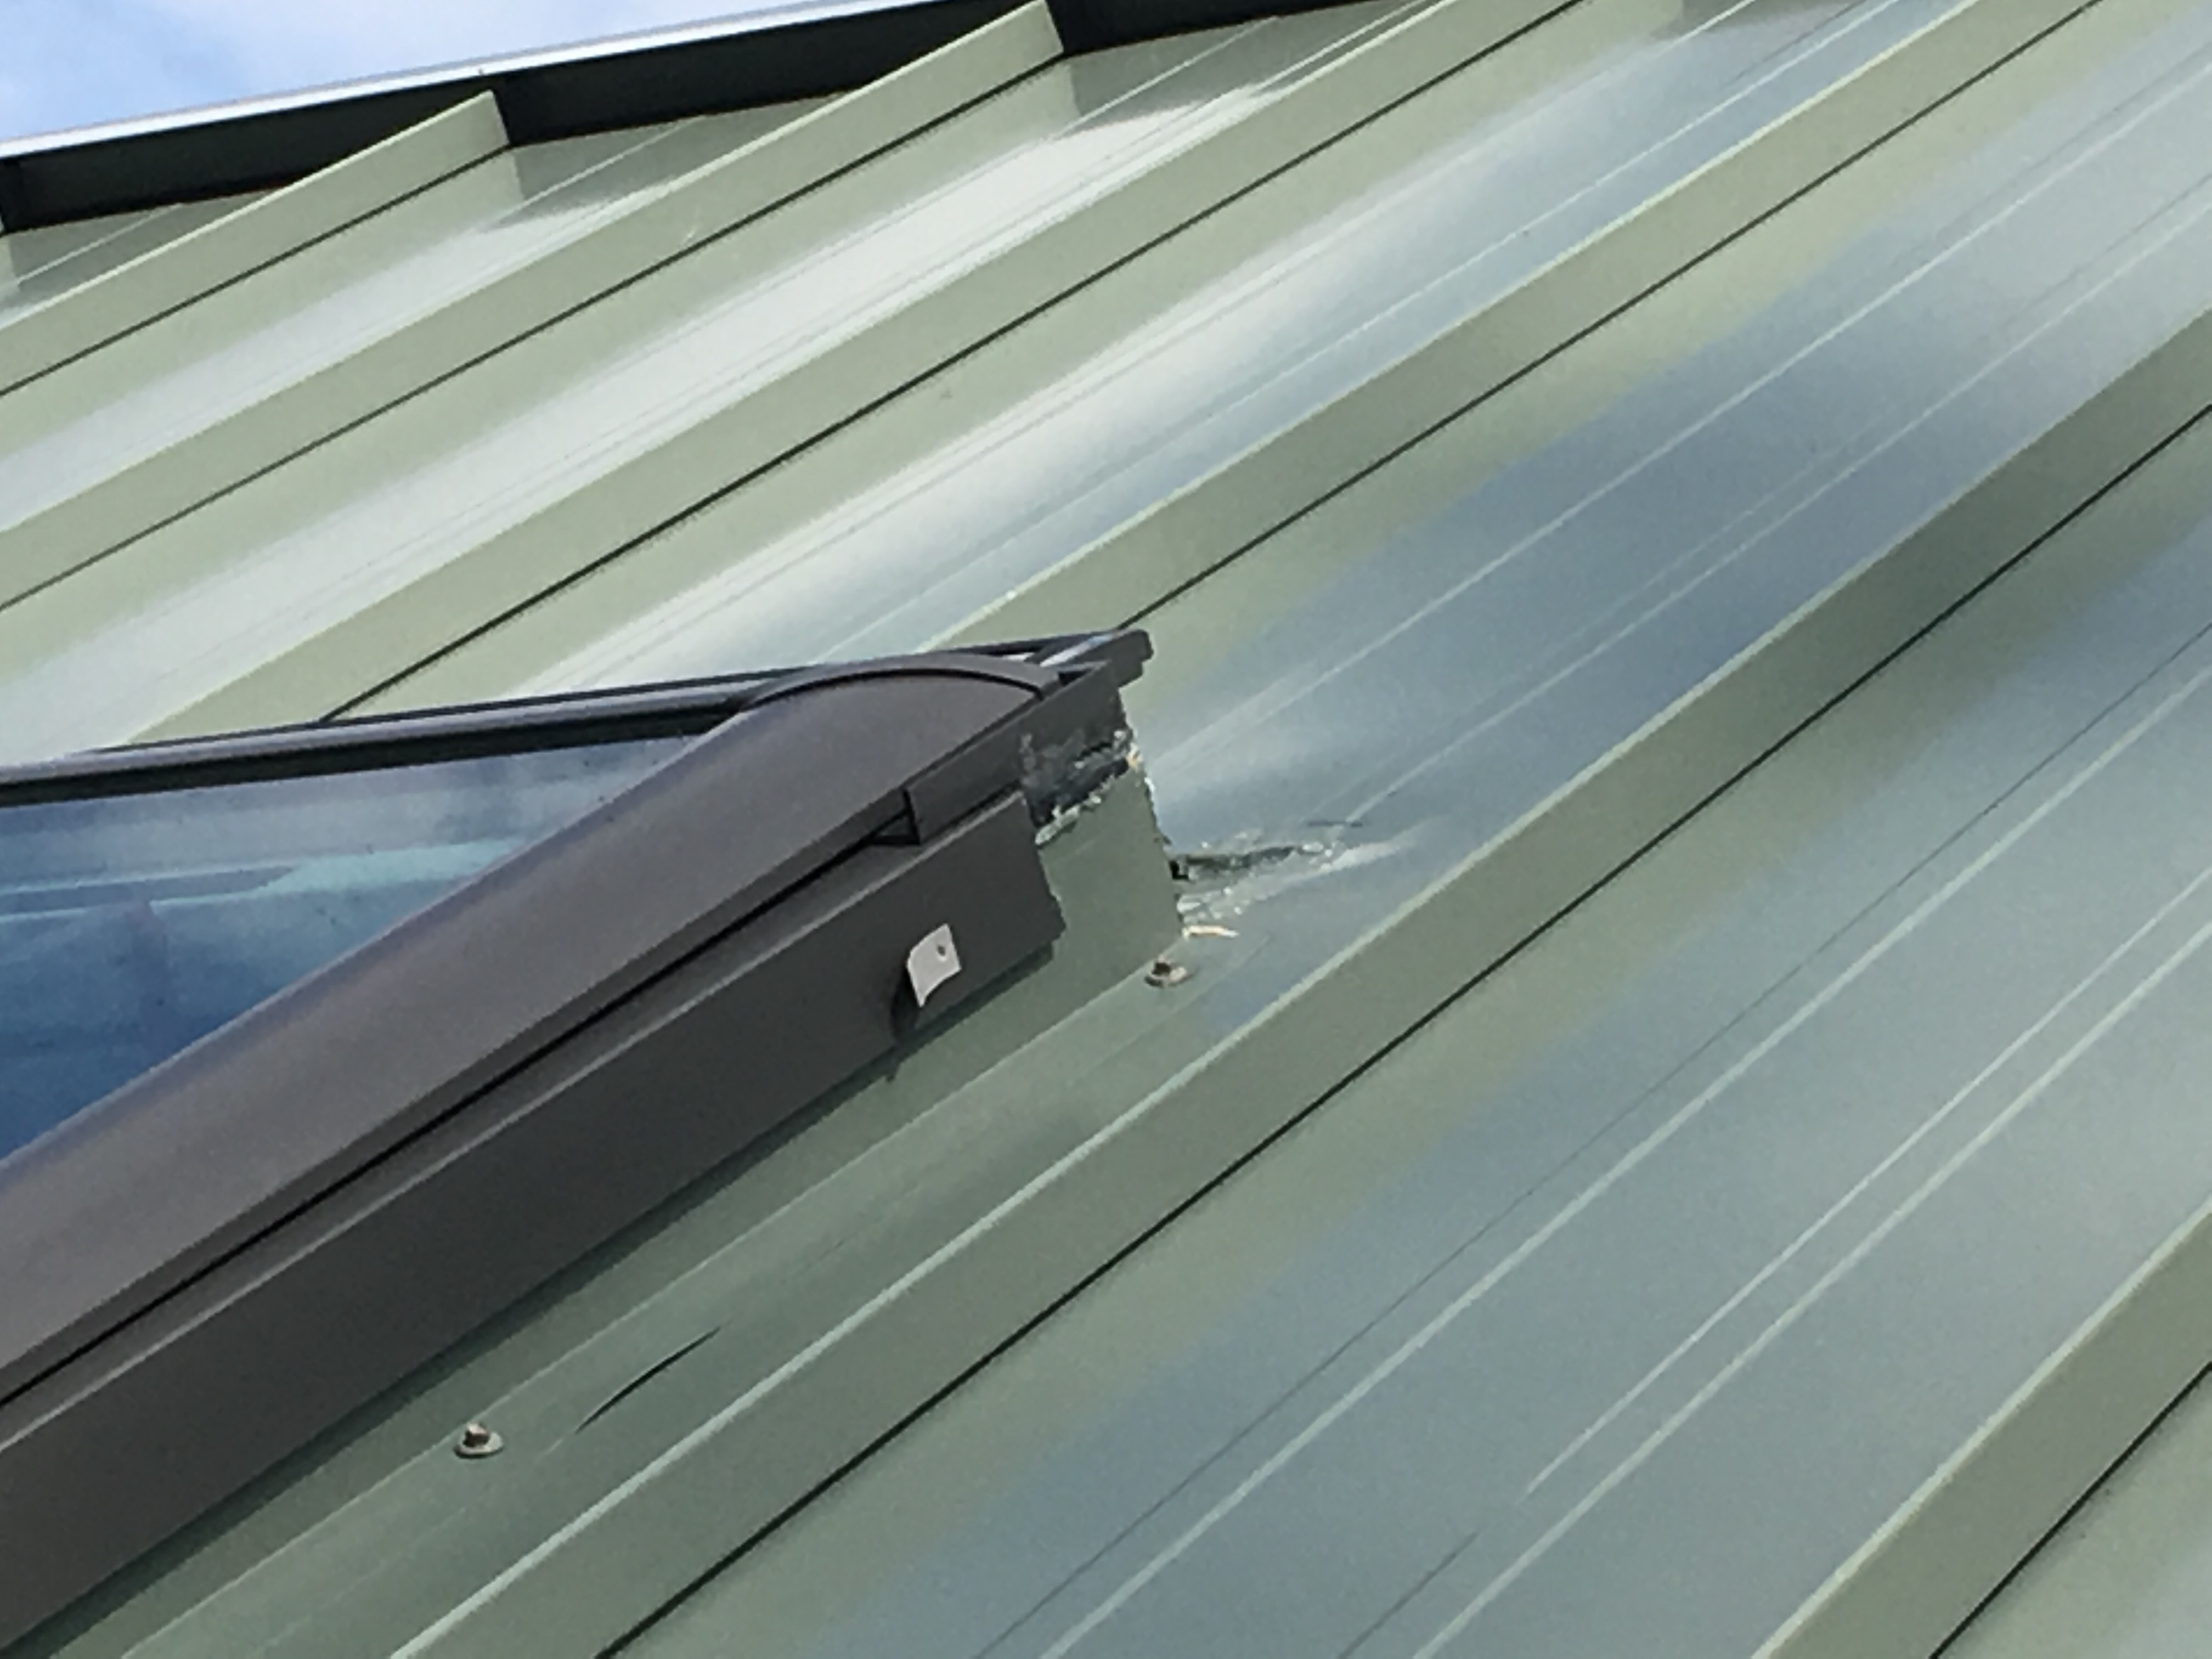 Installation Around Skylight Workmanship Questions I Have Just Had A Standing Seam Metal Roof Installed Christy Schuetze 9 11 2019 Installation Metal Roofing Alliance Forum